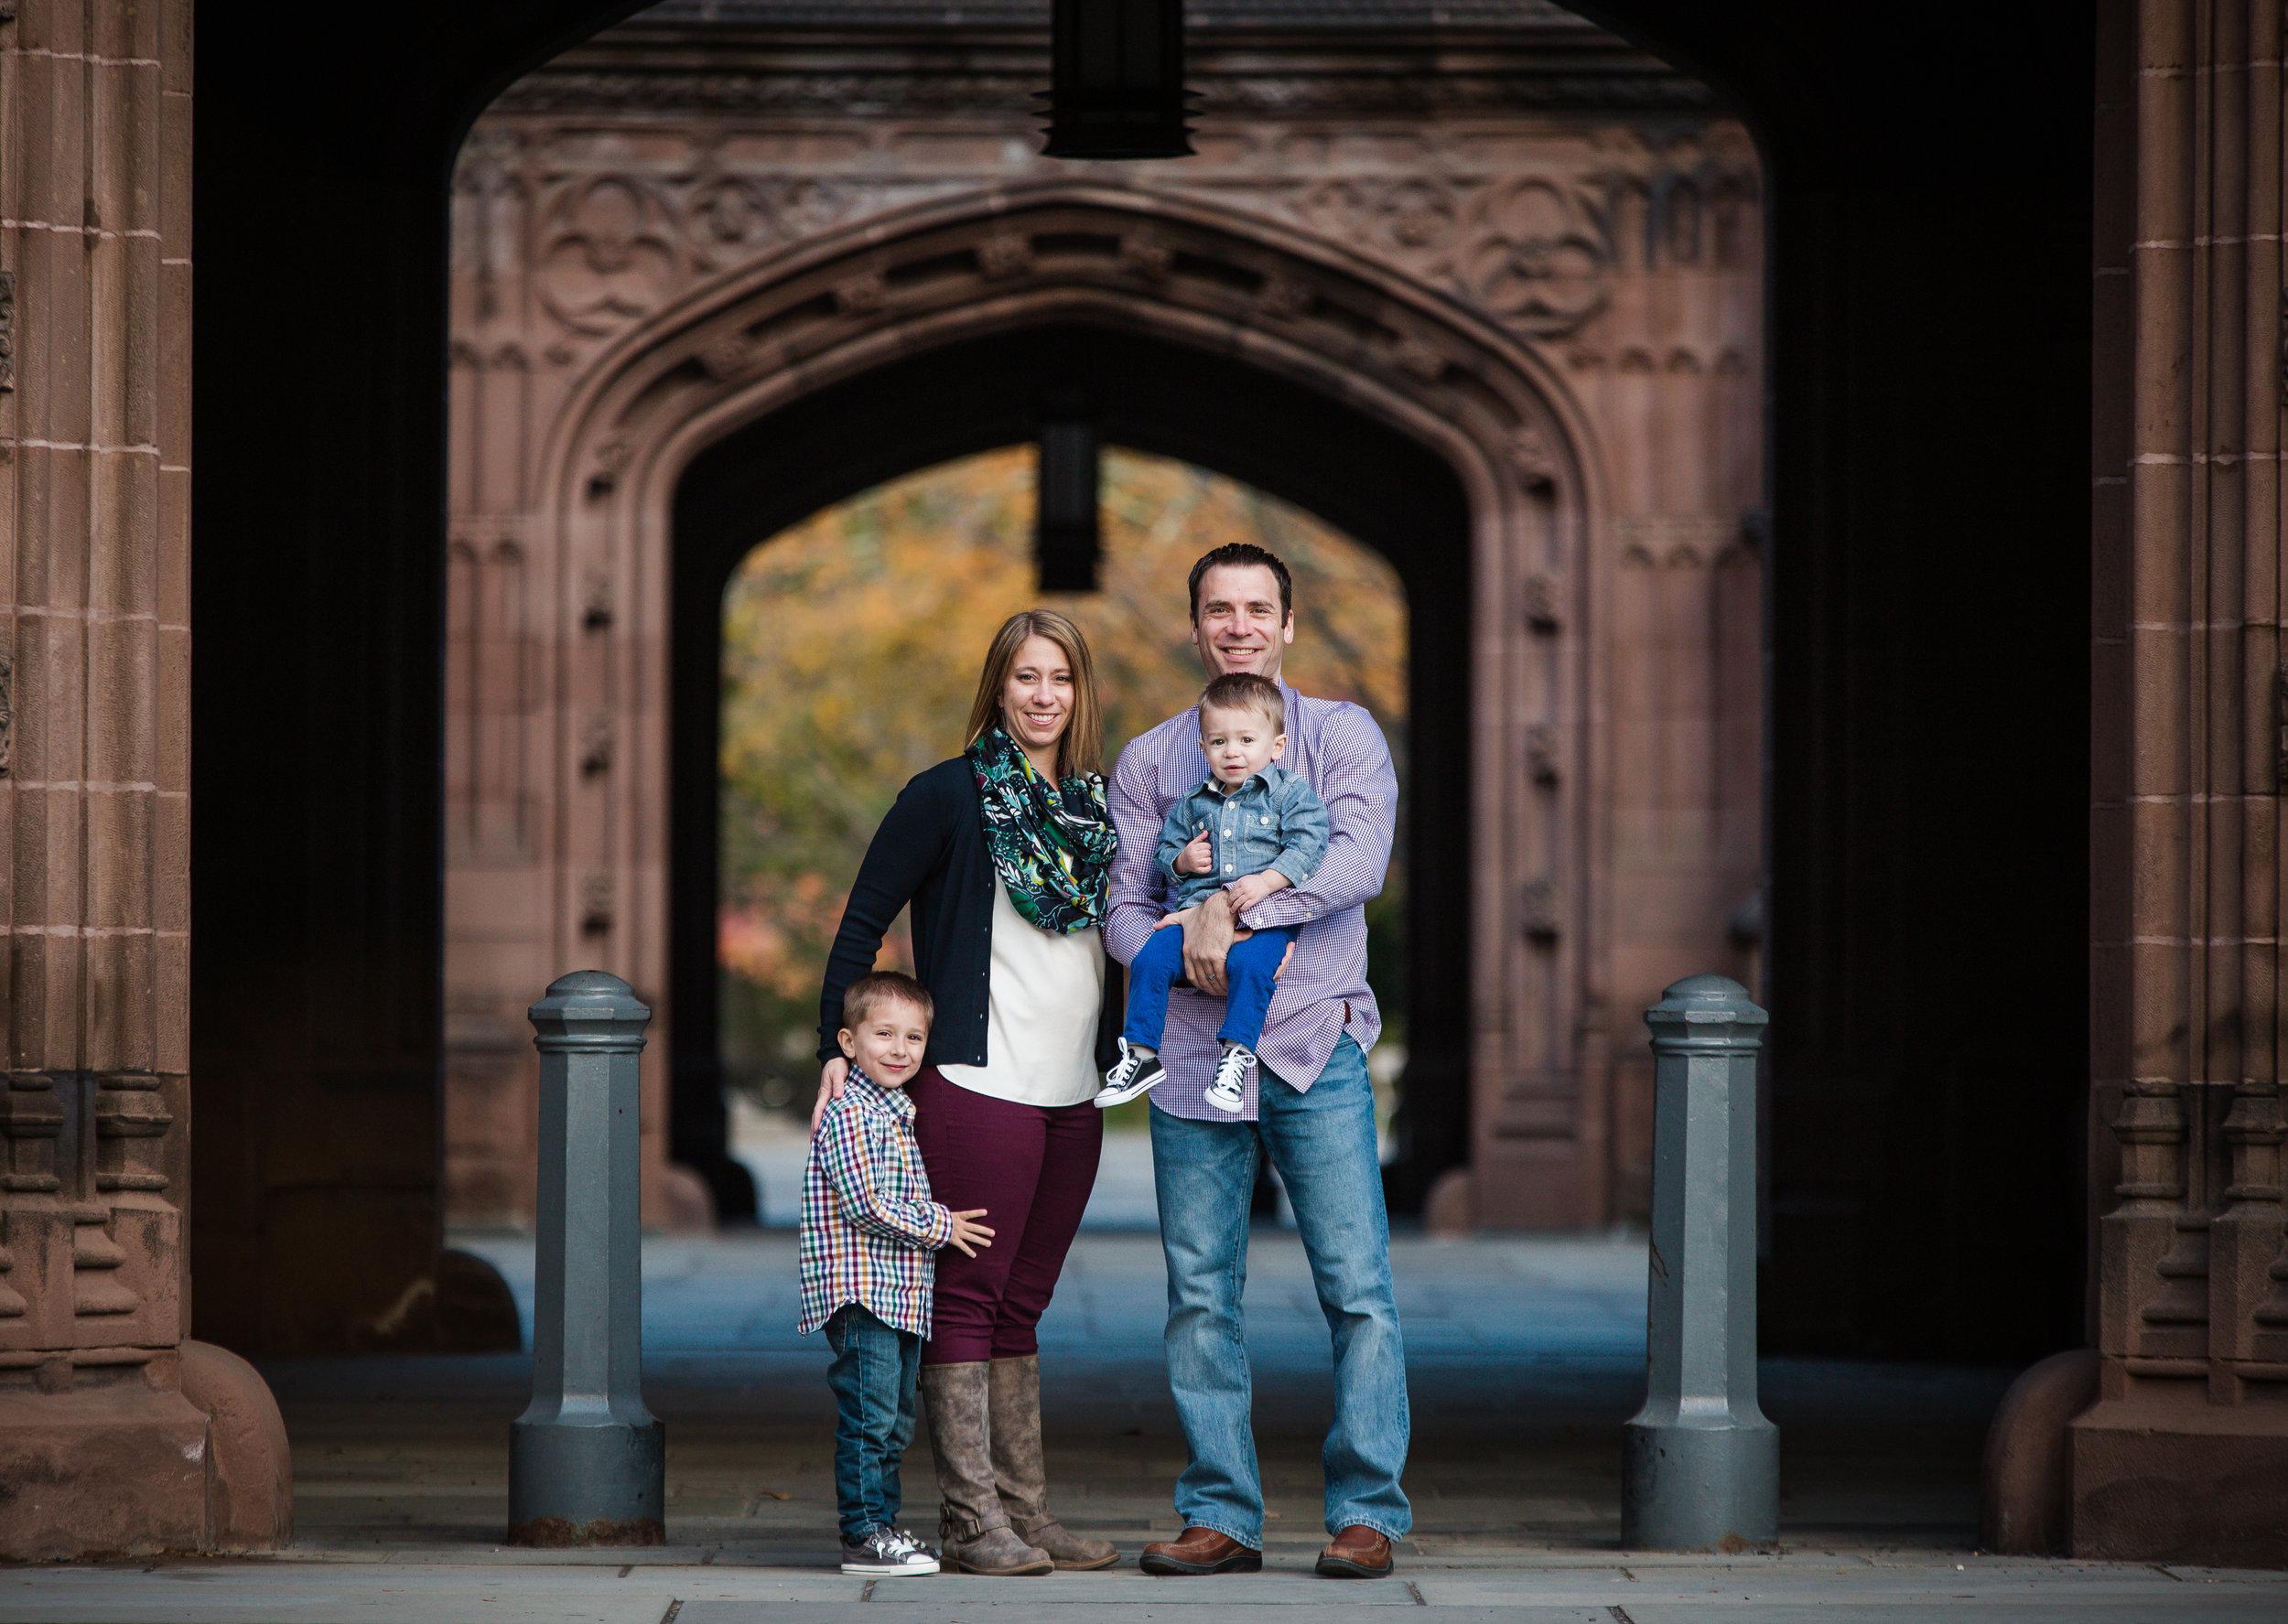 princeton university family session